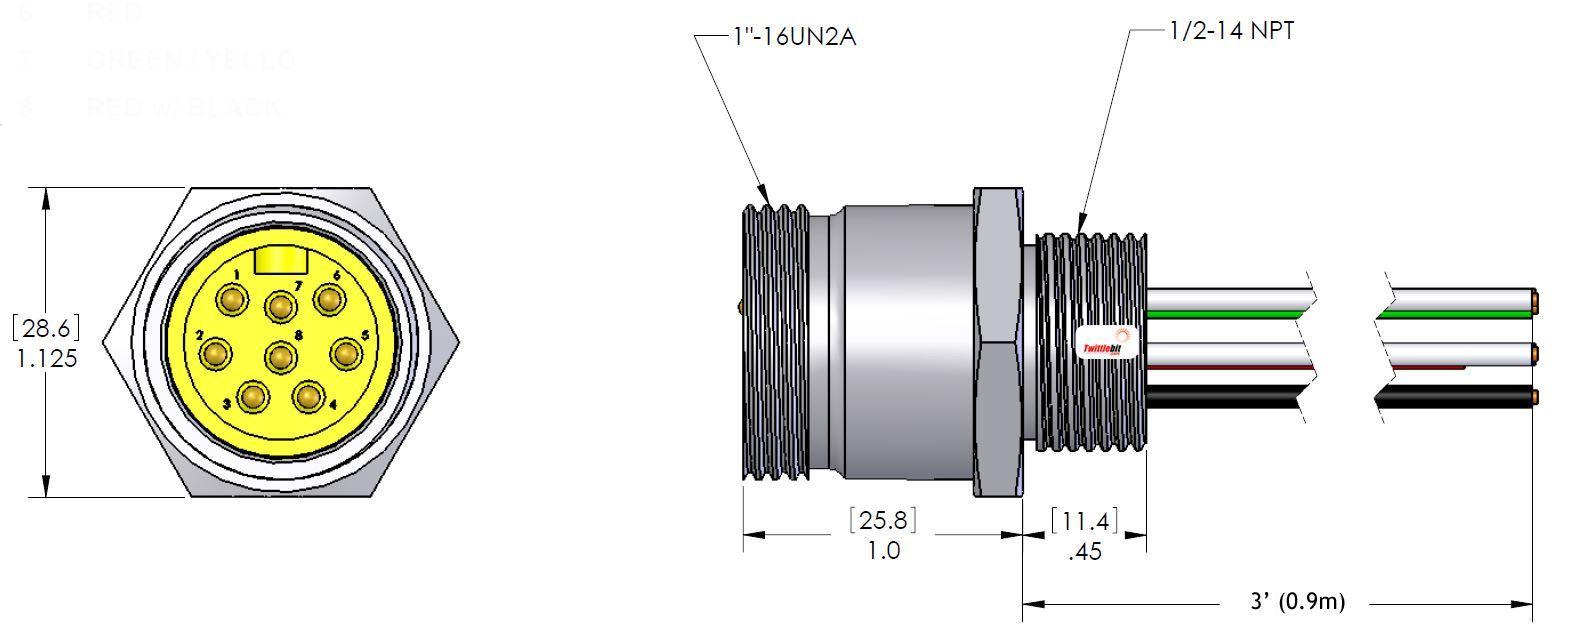 MIN8MR2318, MINI (Size 2) 8 Pole PVC Straight Receptacles